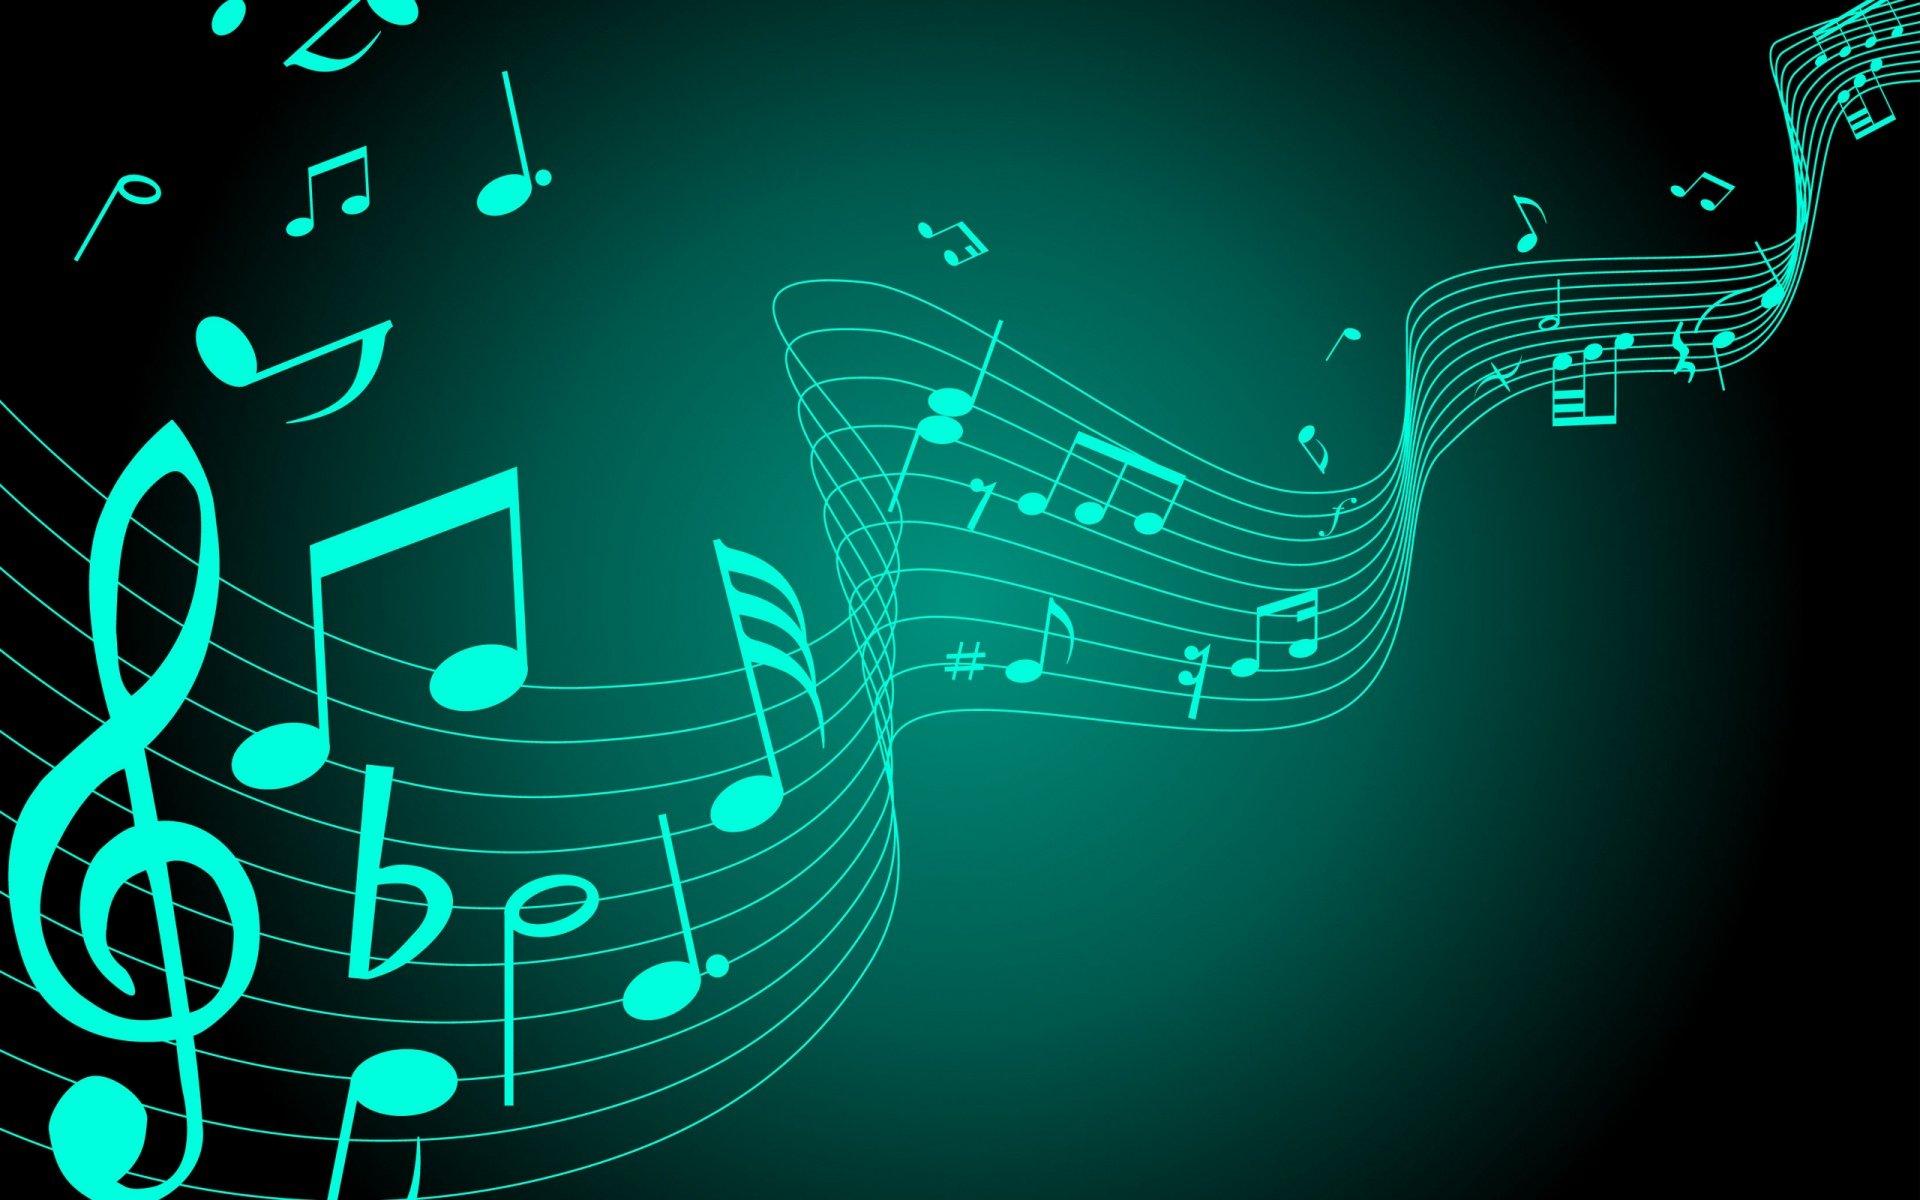 Music Wallpaper Hd 1080p 42